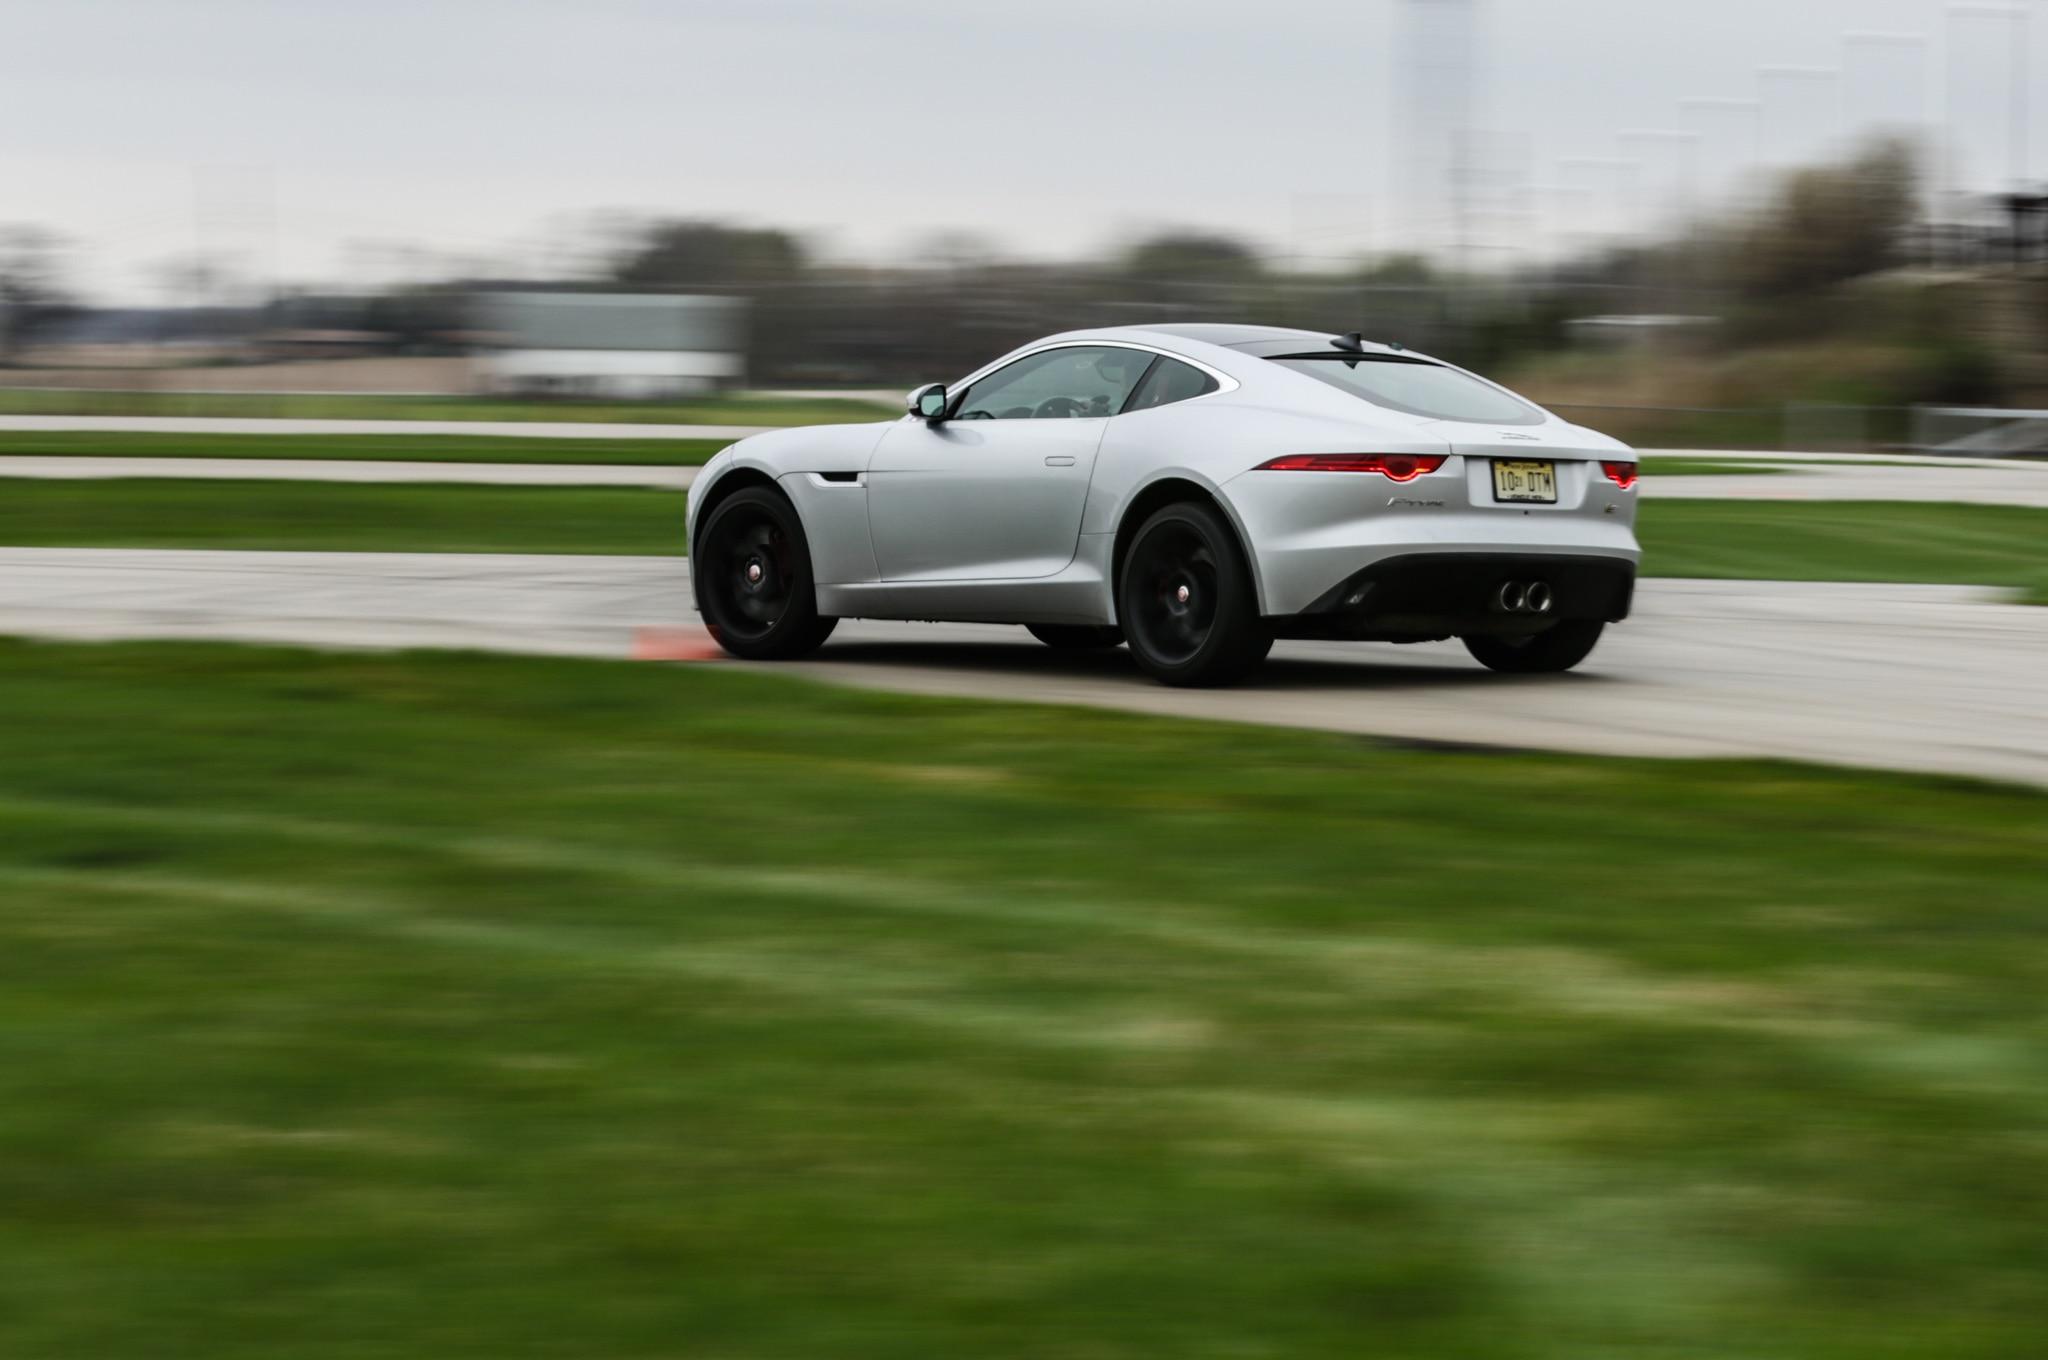 Jaguar FType S Coupe How Do Worn Tires Affect Performance - 2015 jaguar f type v8 s